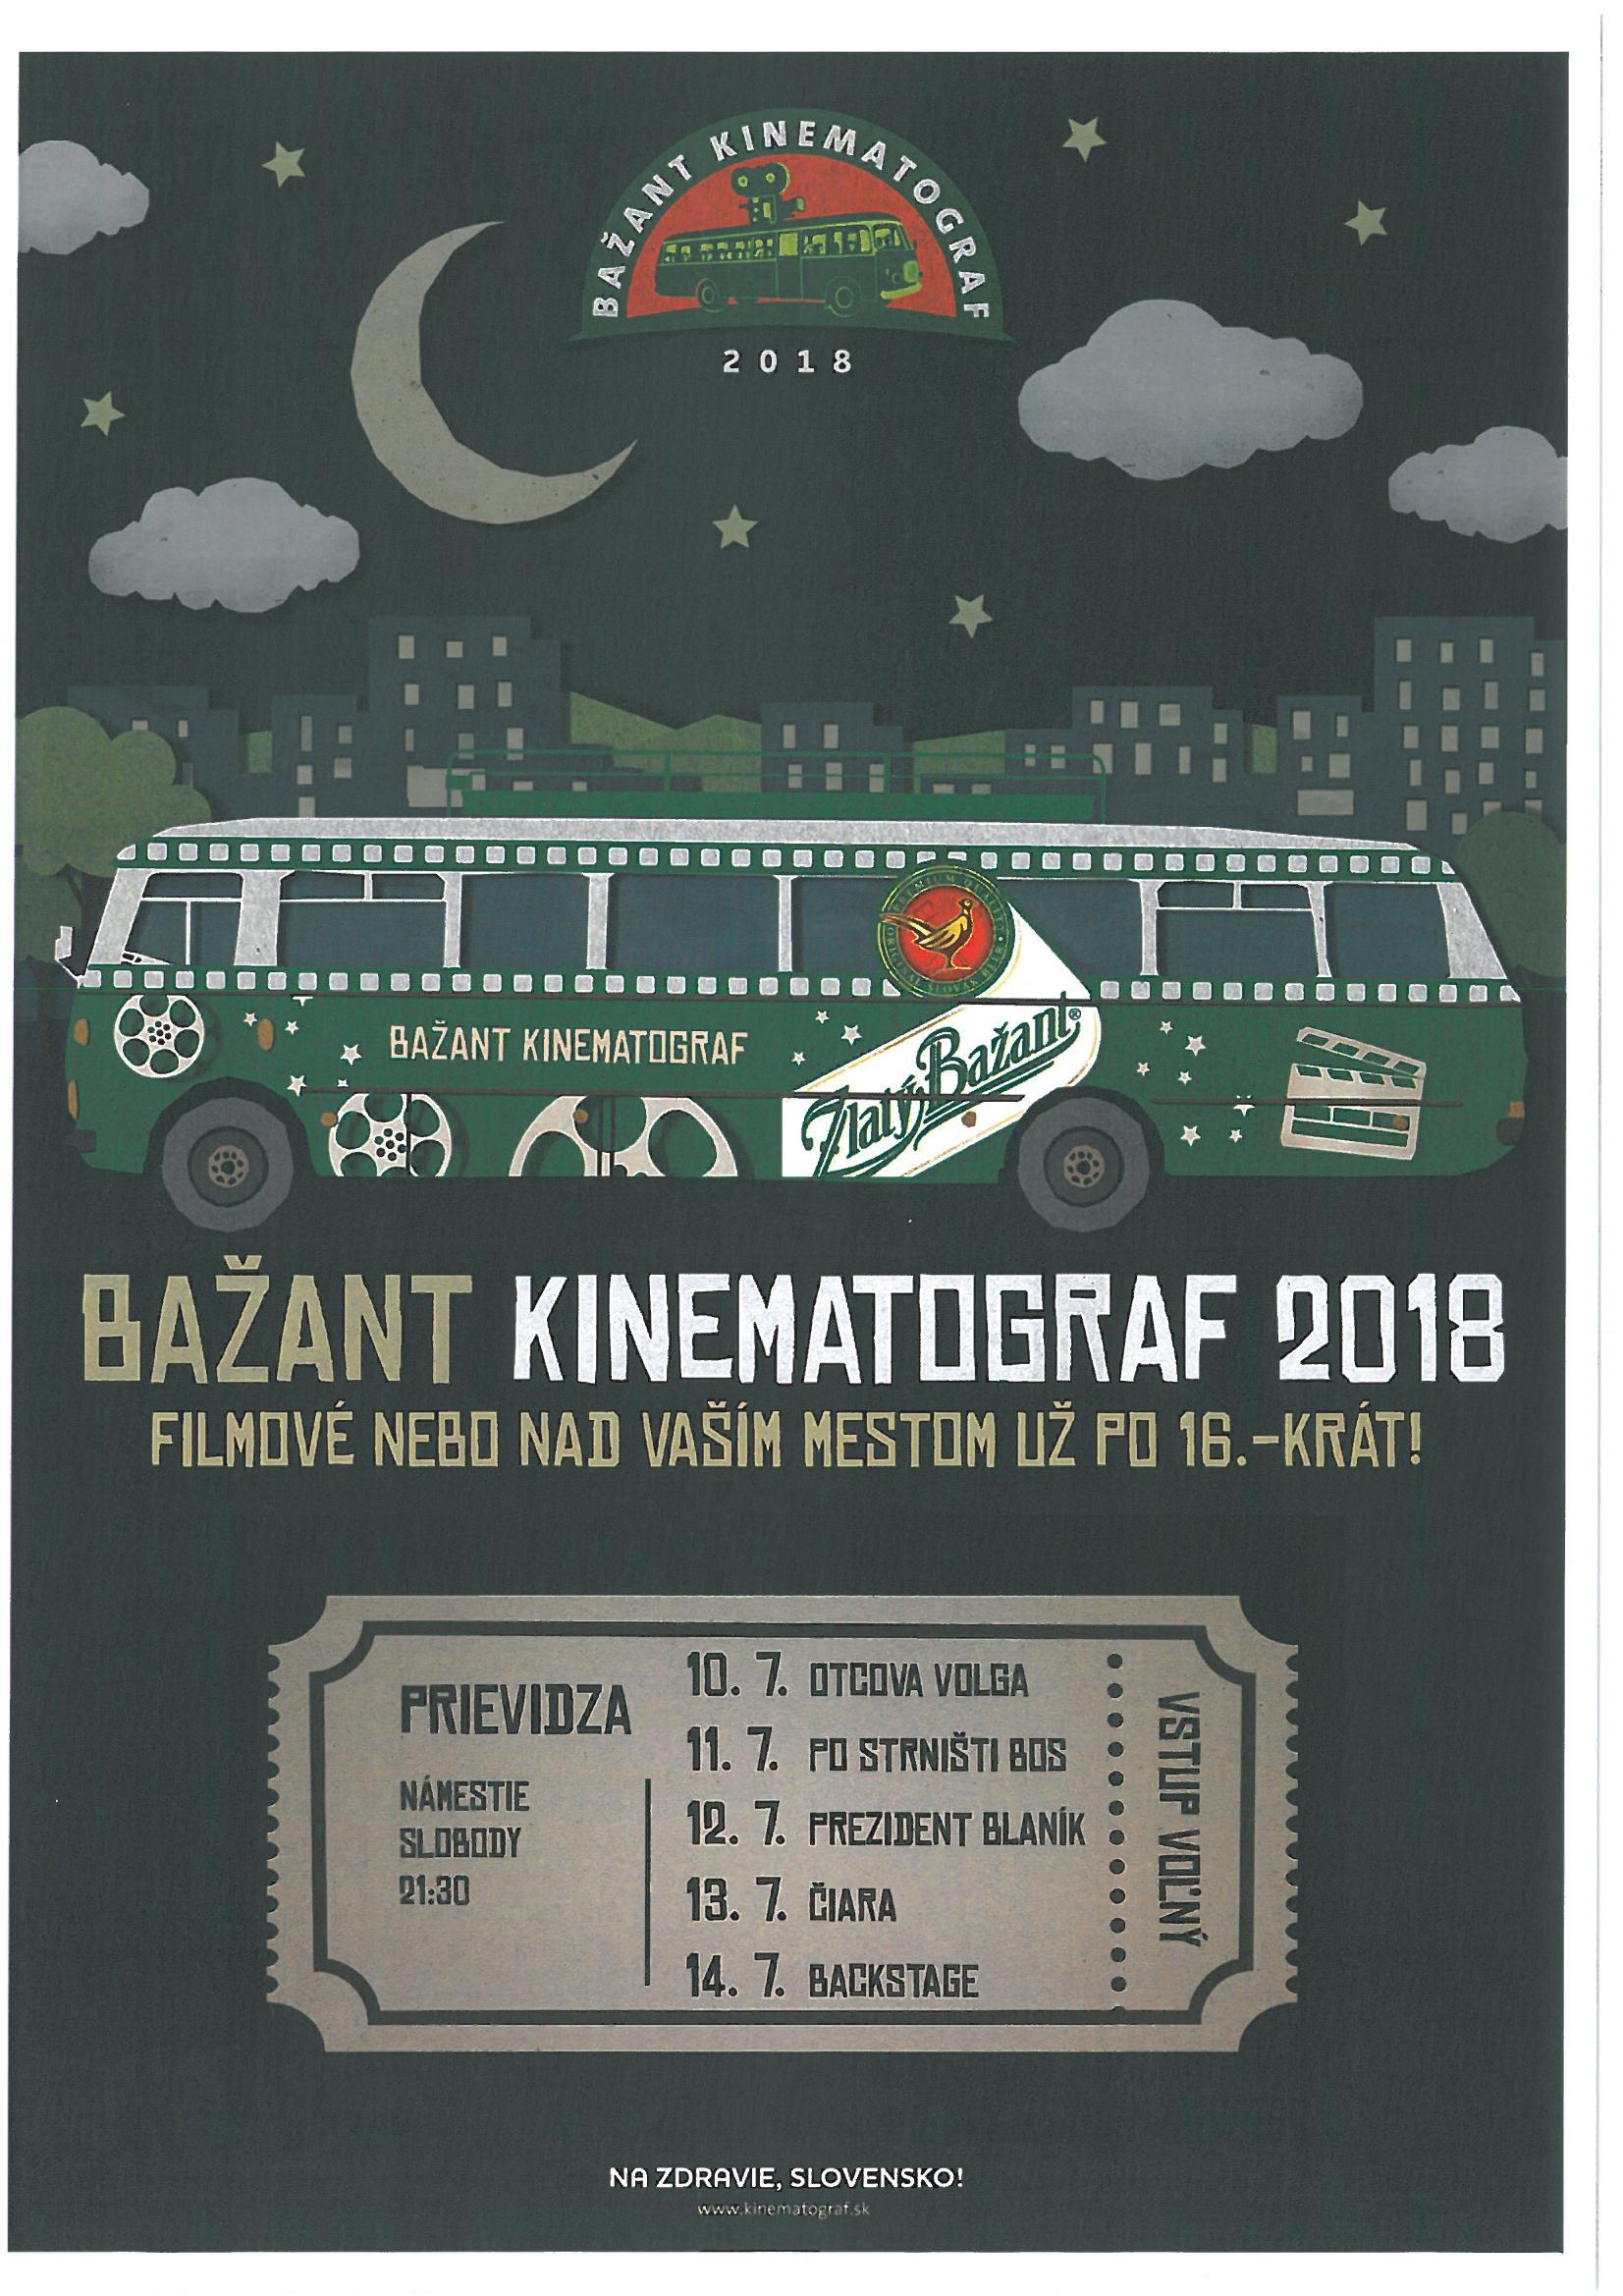 9faffaae0 Bažant Kinematograf 2018 - Prievidza | codnes.sk